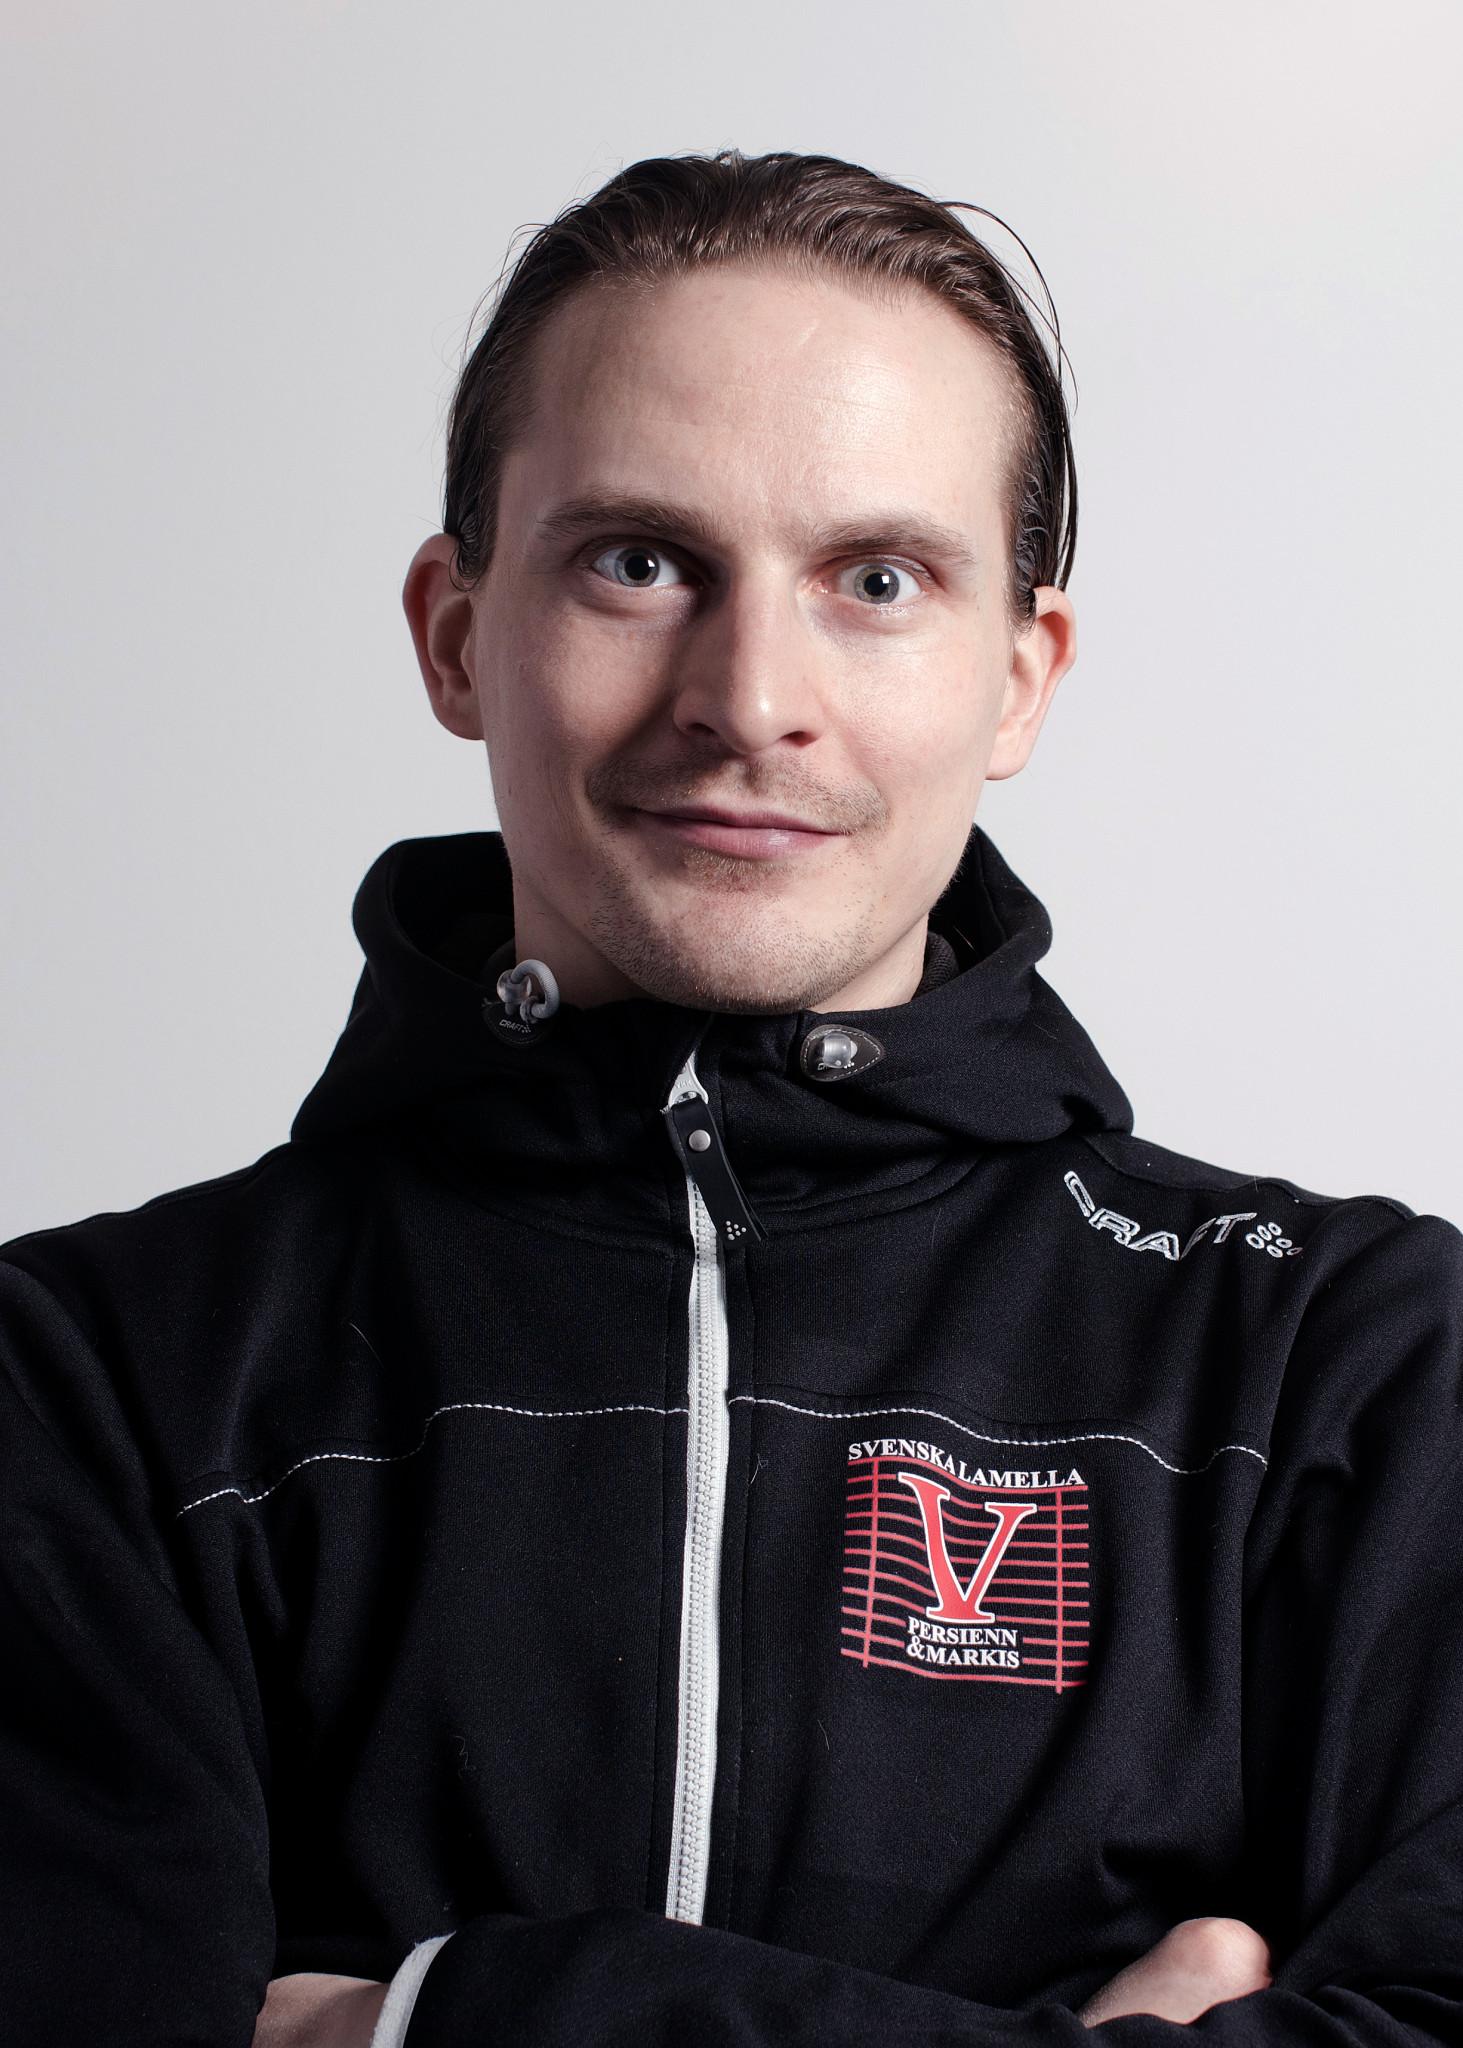 Patrik Samuelsson